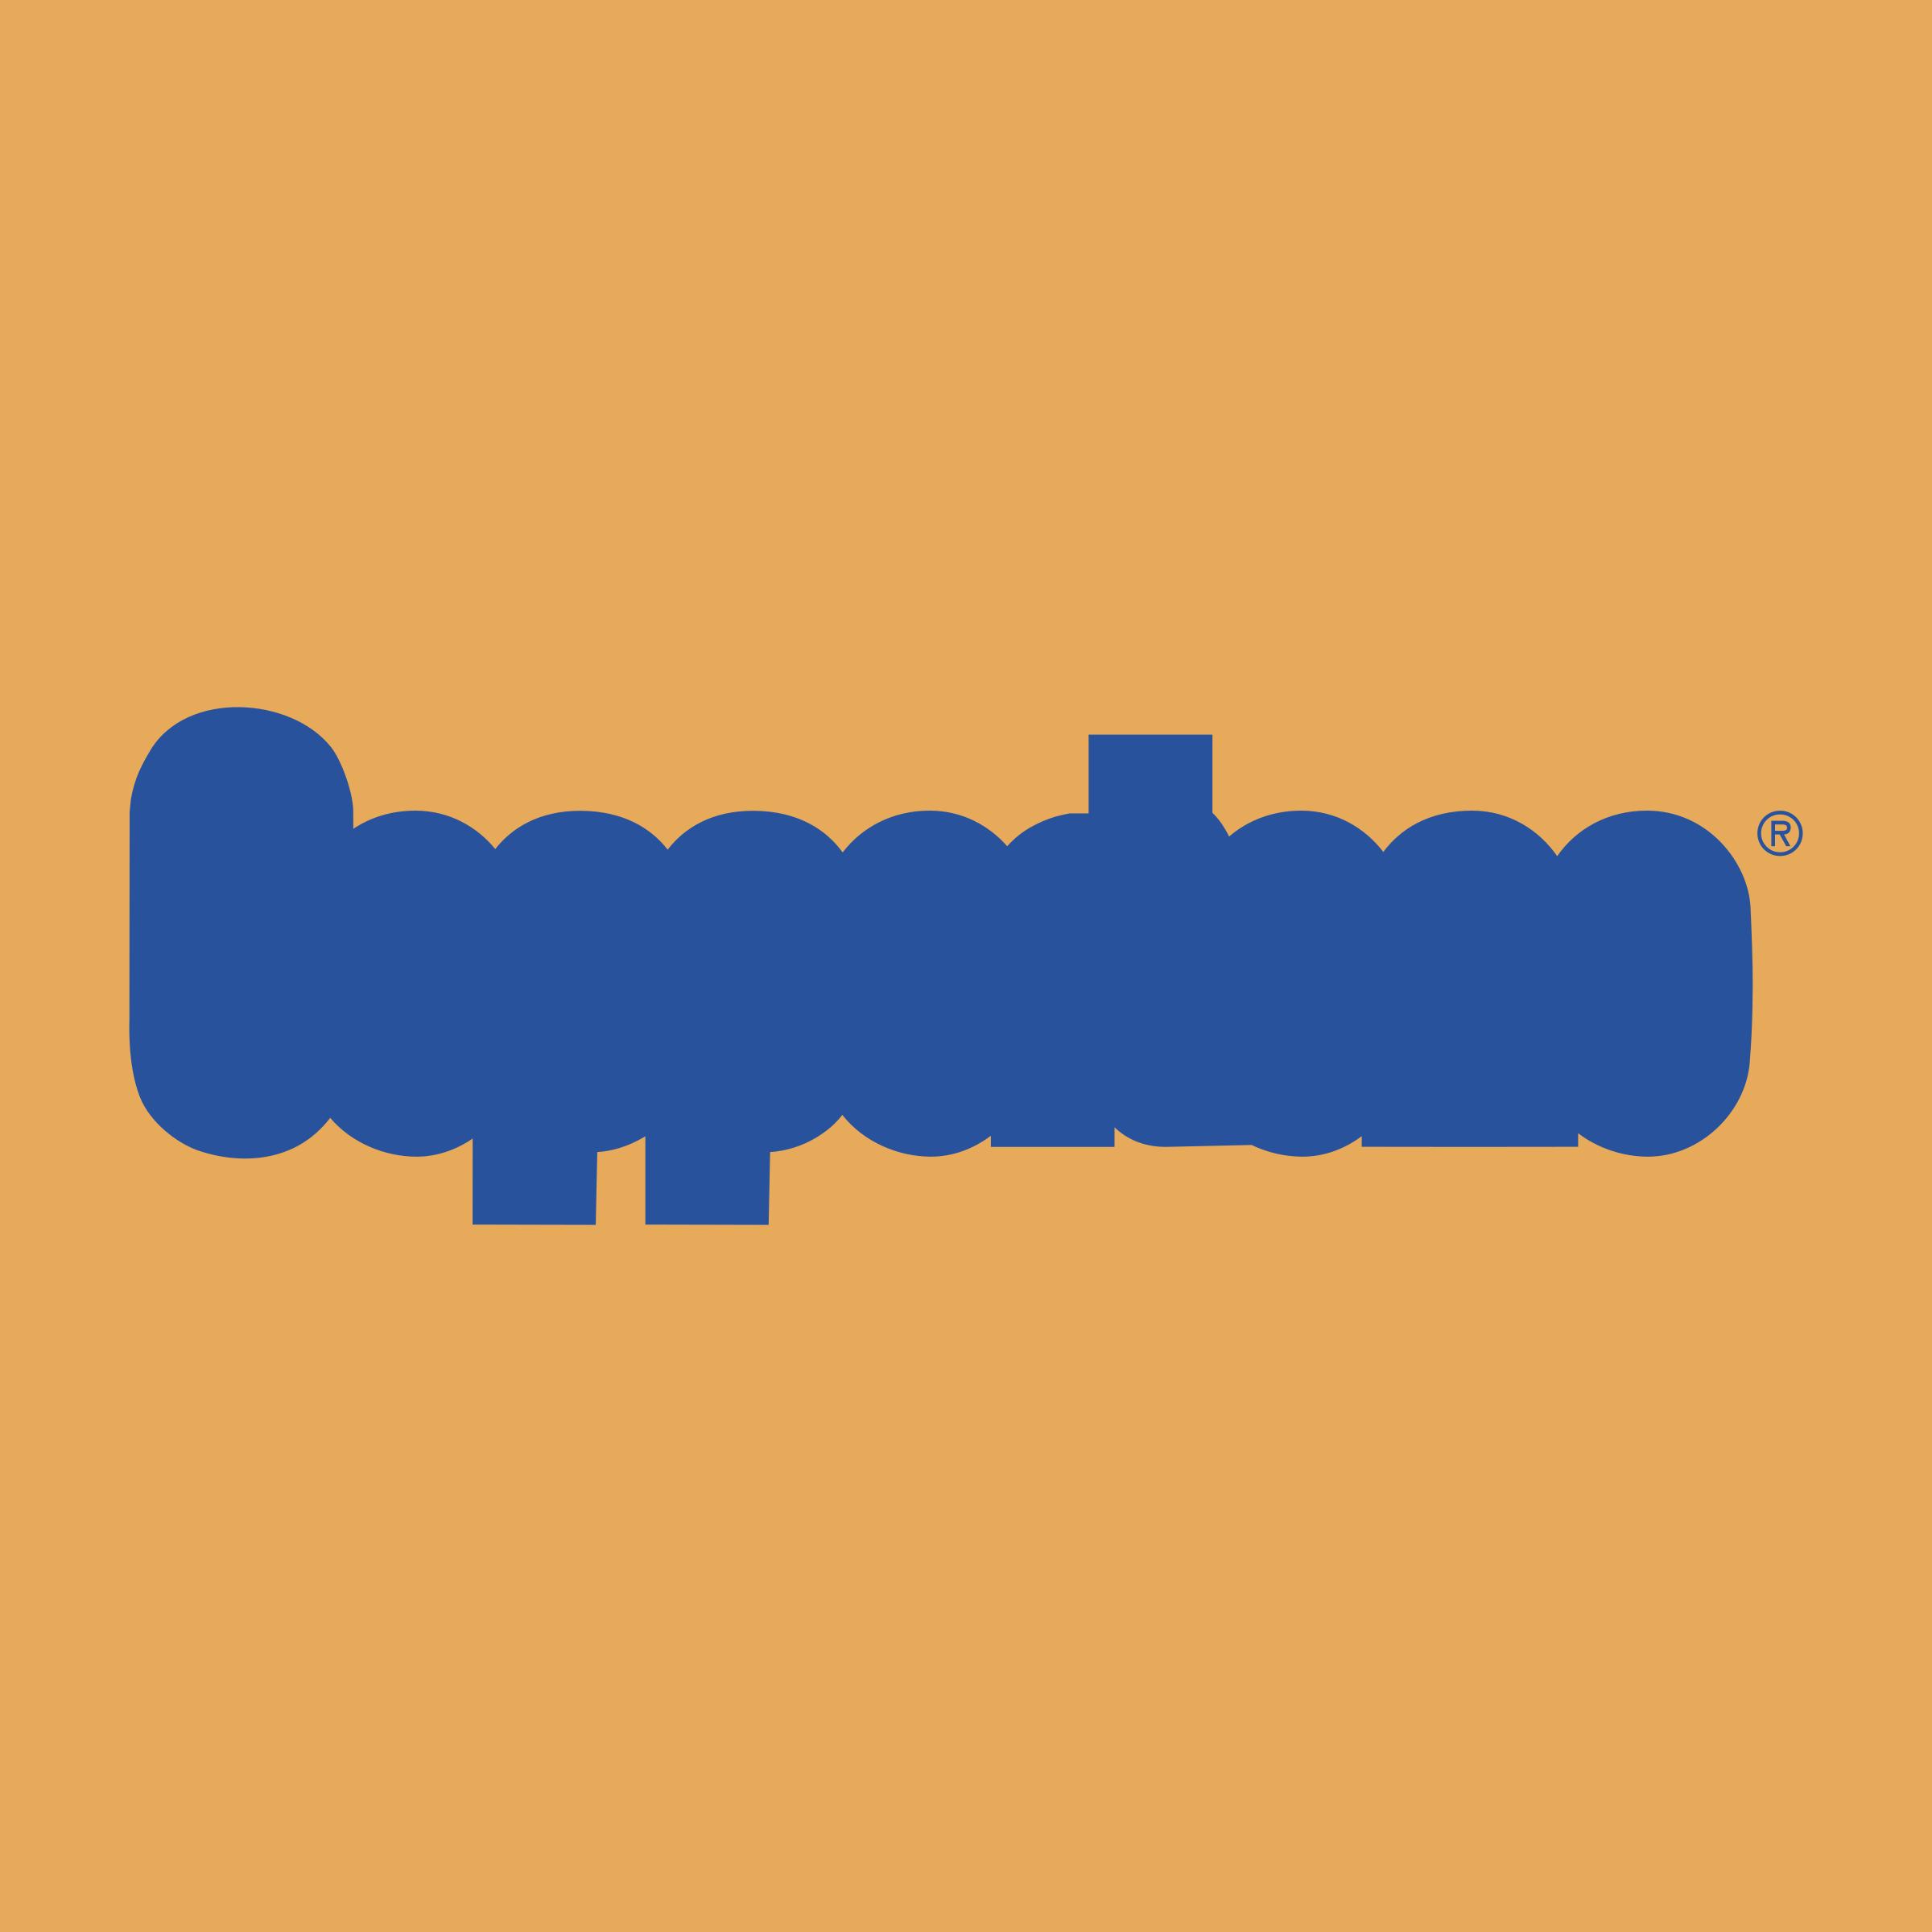 Coppertone Logo PNG Transparent & SVG Vector.